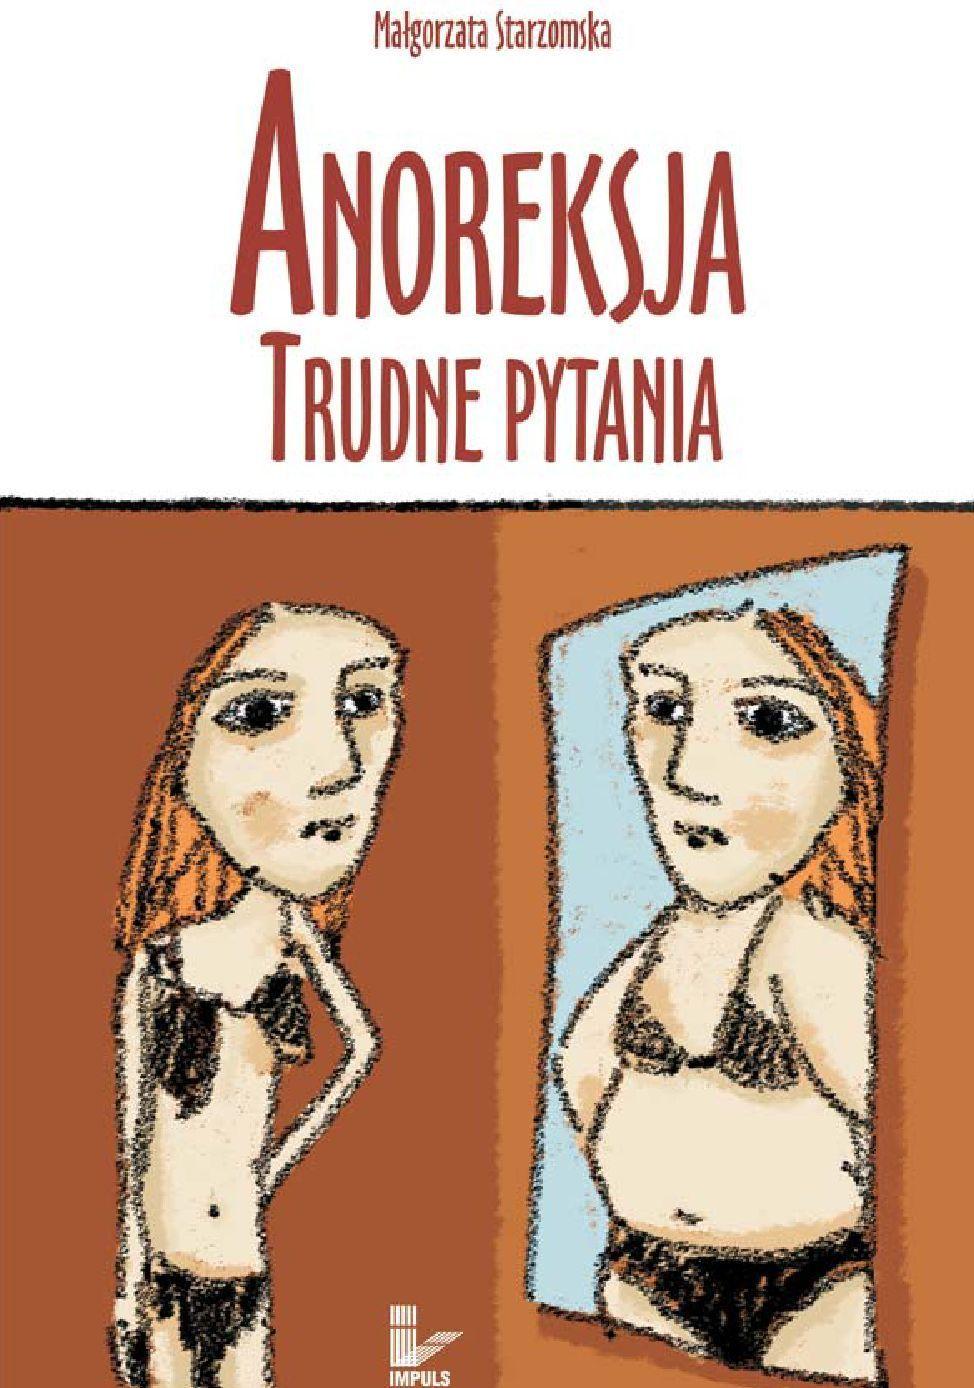 Anoreksja. Trudne pytania - Ebook (Książka na Kindle) do pobrania w formacie MOBI